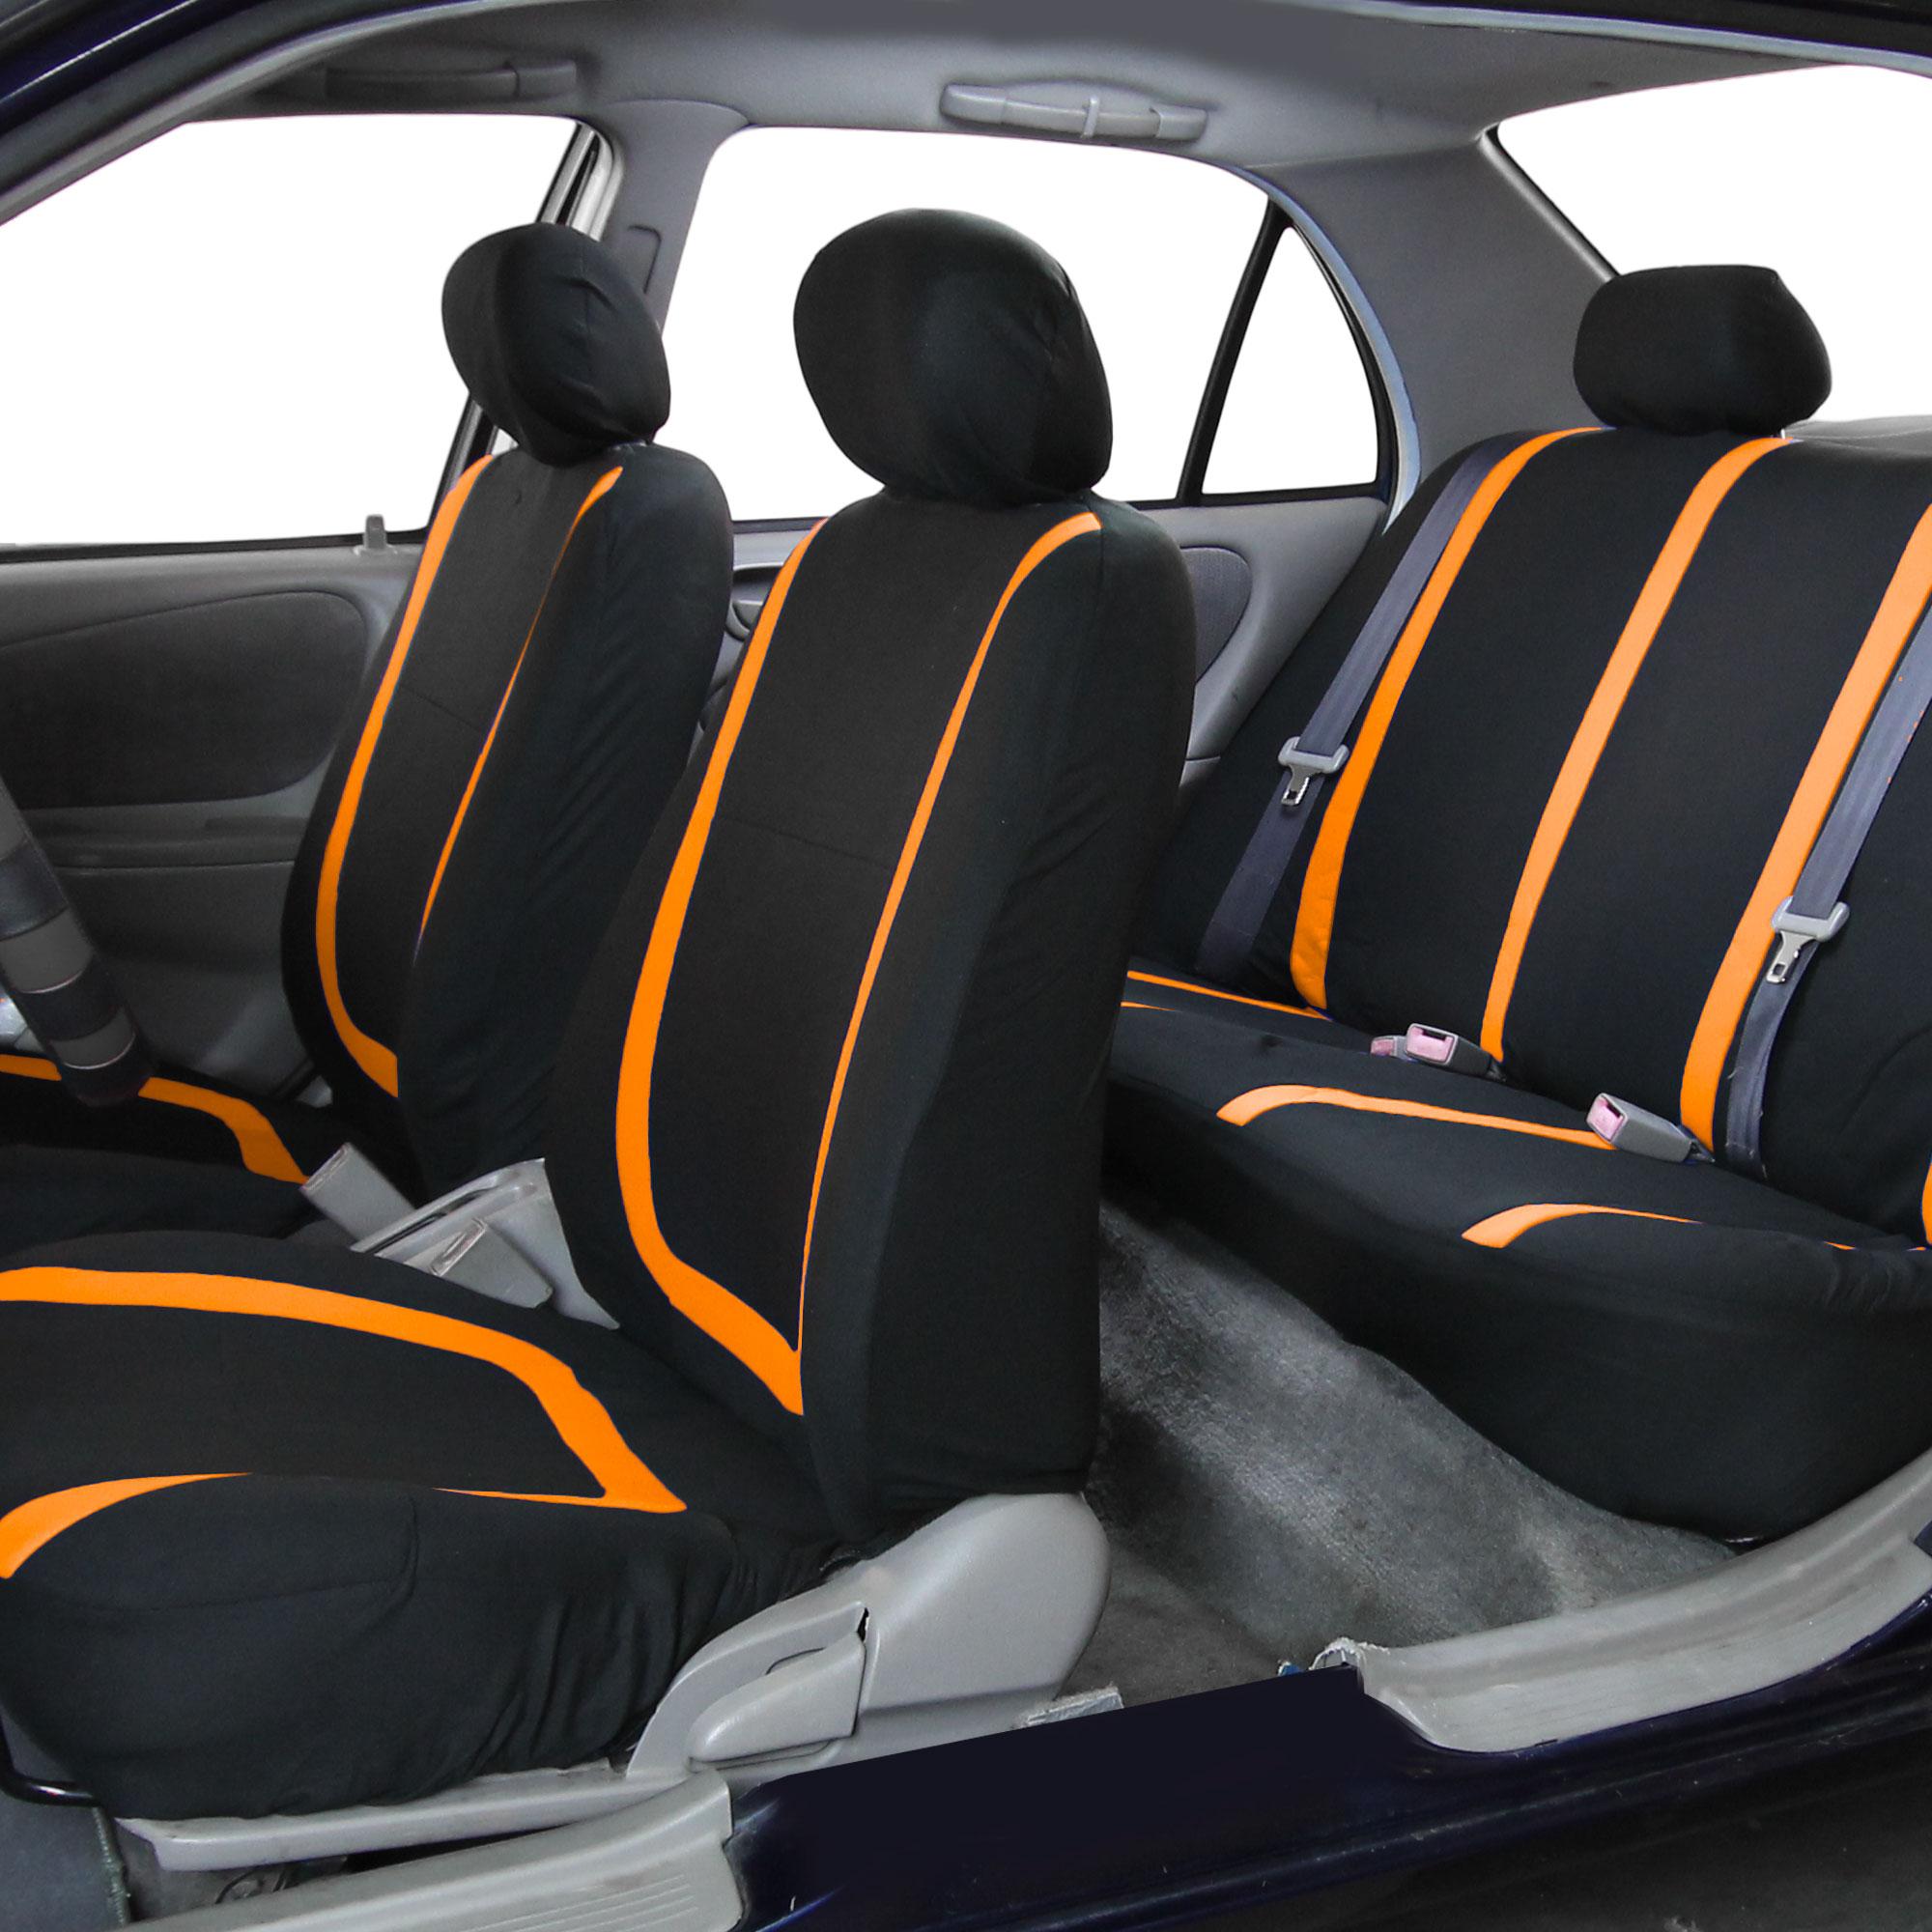 auto seat covers for car sedan truck van universal seat covers 12 colors ebay. Black Bedroom Furniture Sets. Home Design Ideas